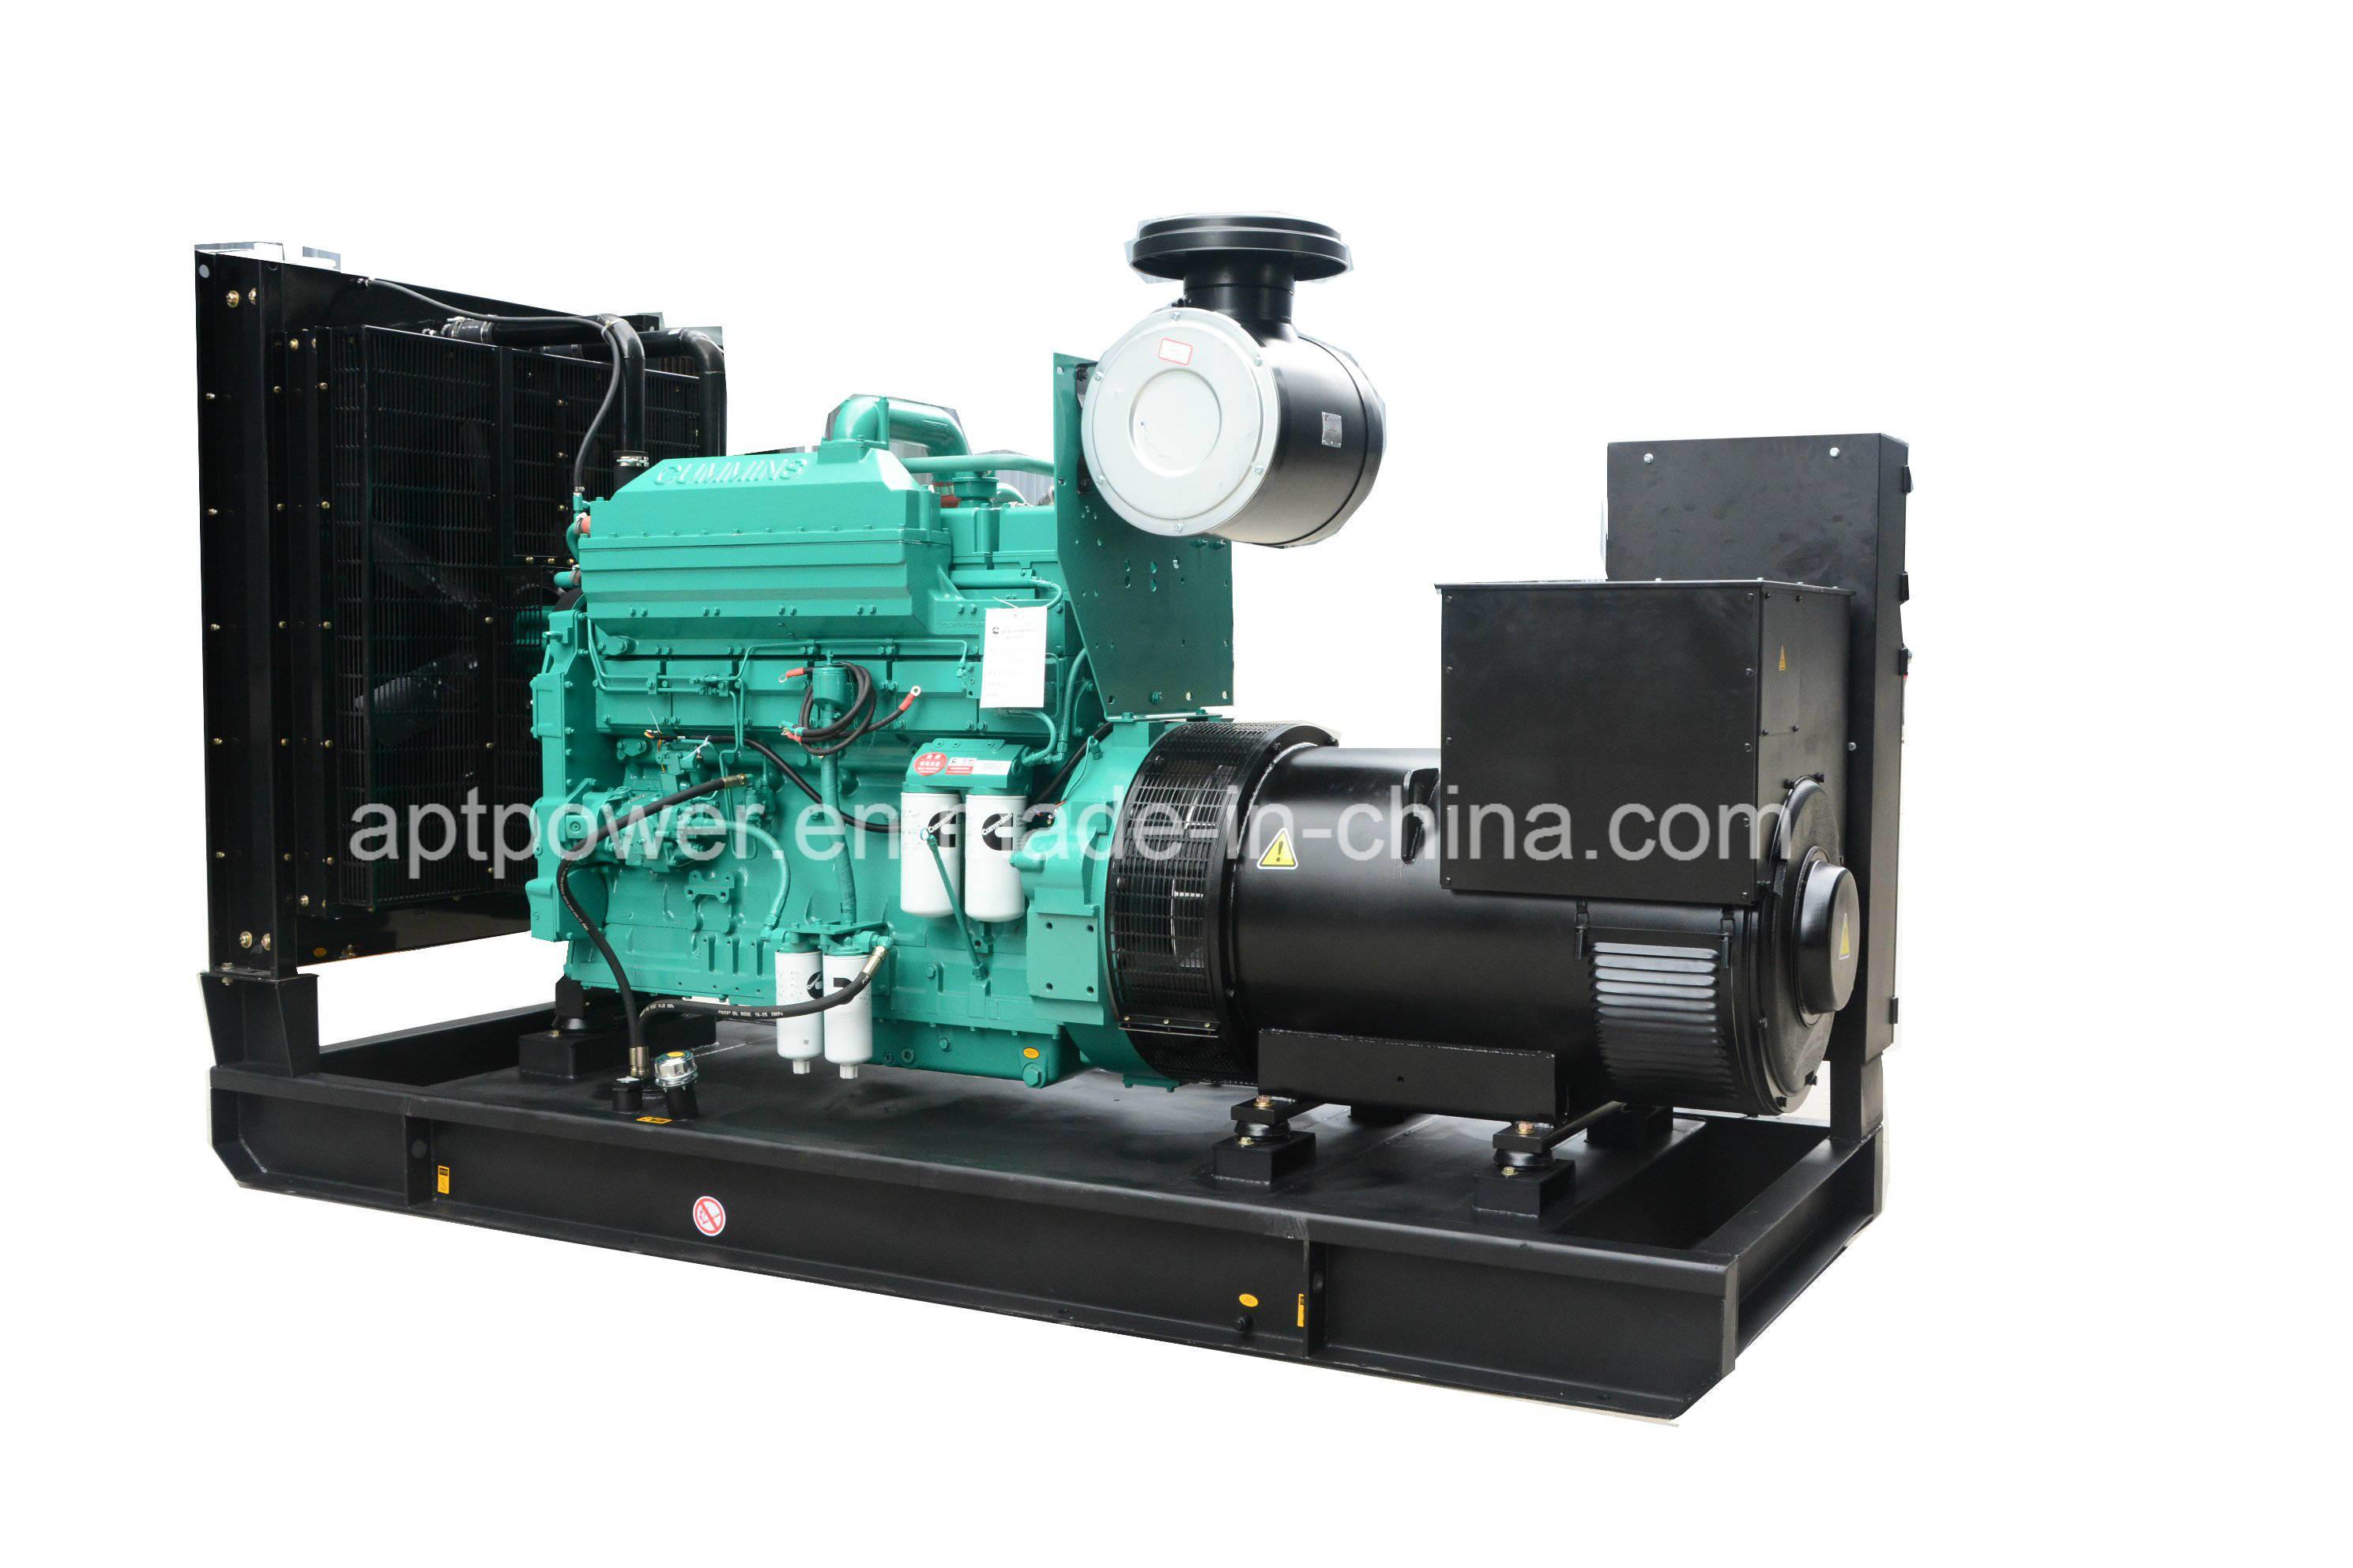 China 6 Cylinder Inline Fawde 200kw Diesel Powered Generator